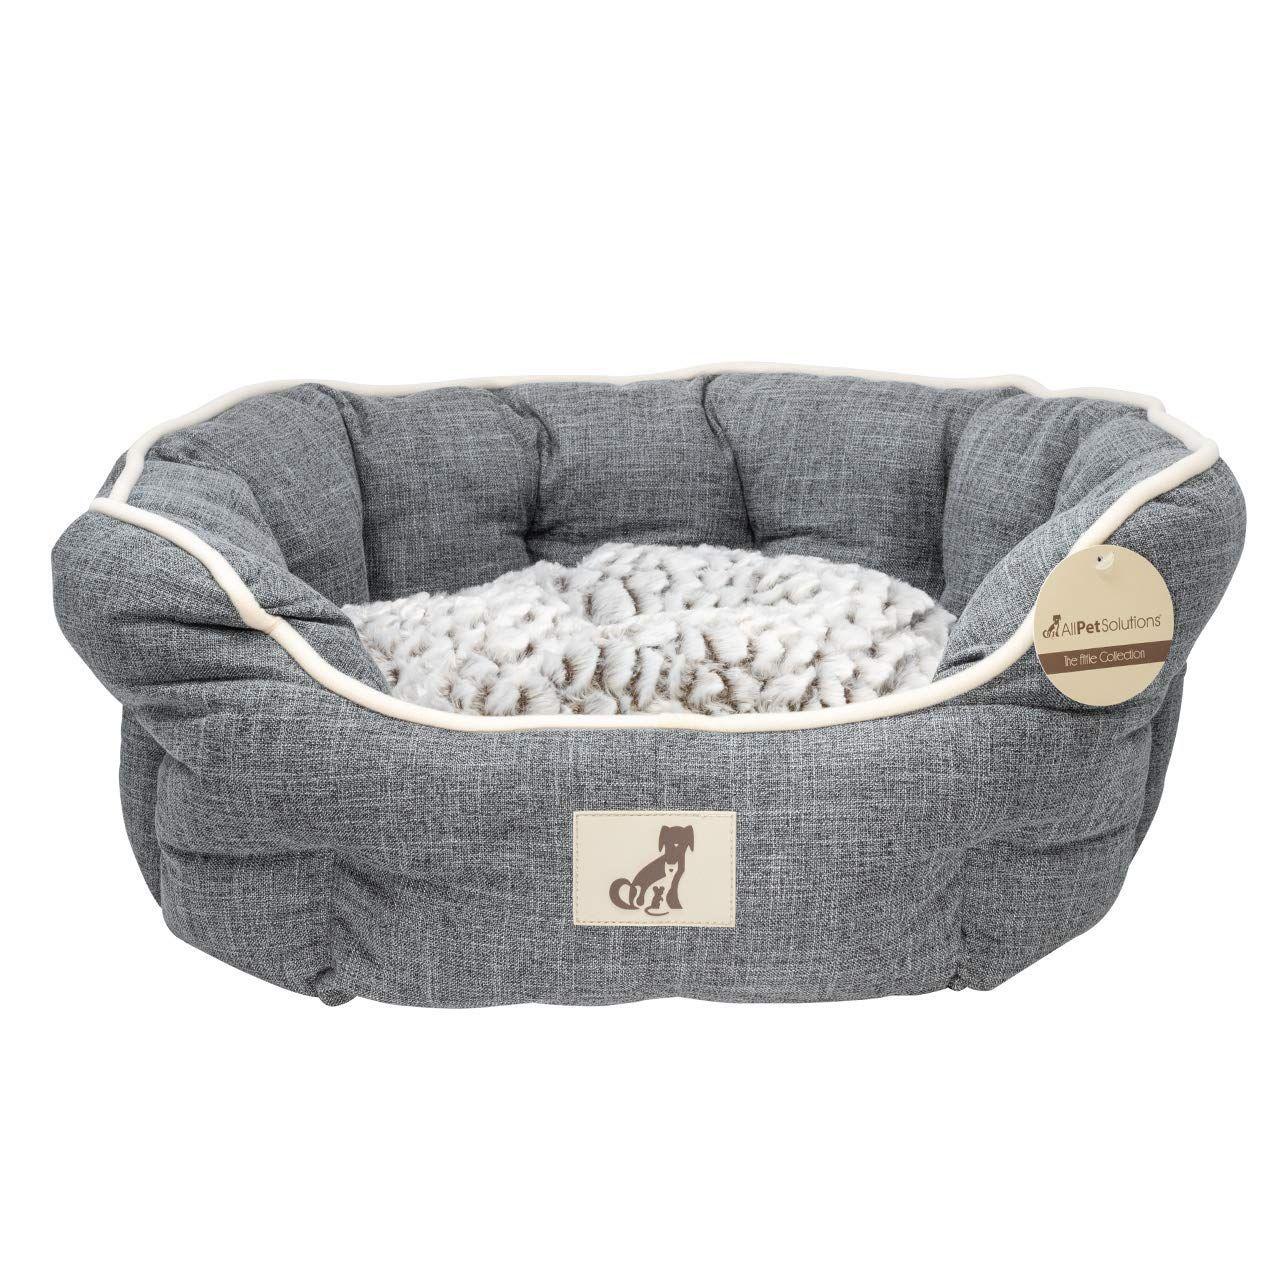 All Pet Solutions Alfie Range Fleece Lined Warm Luxury Dog